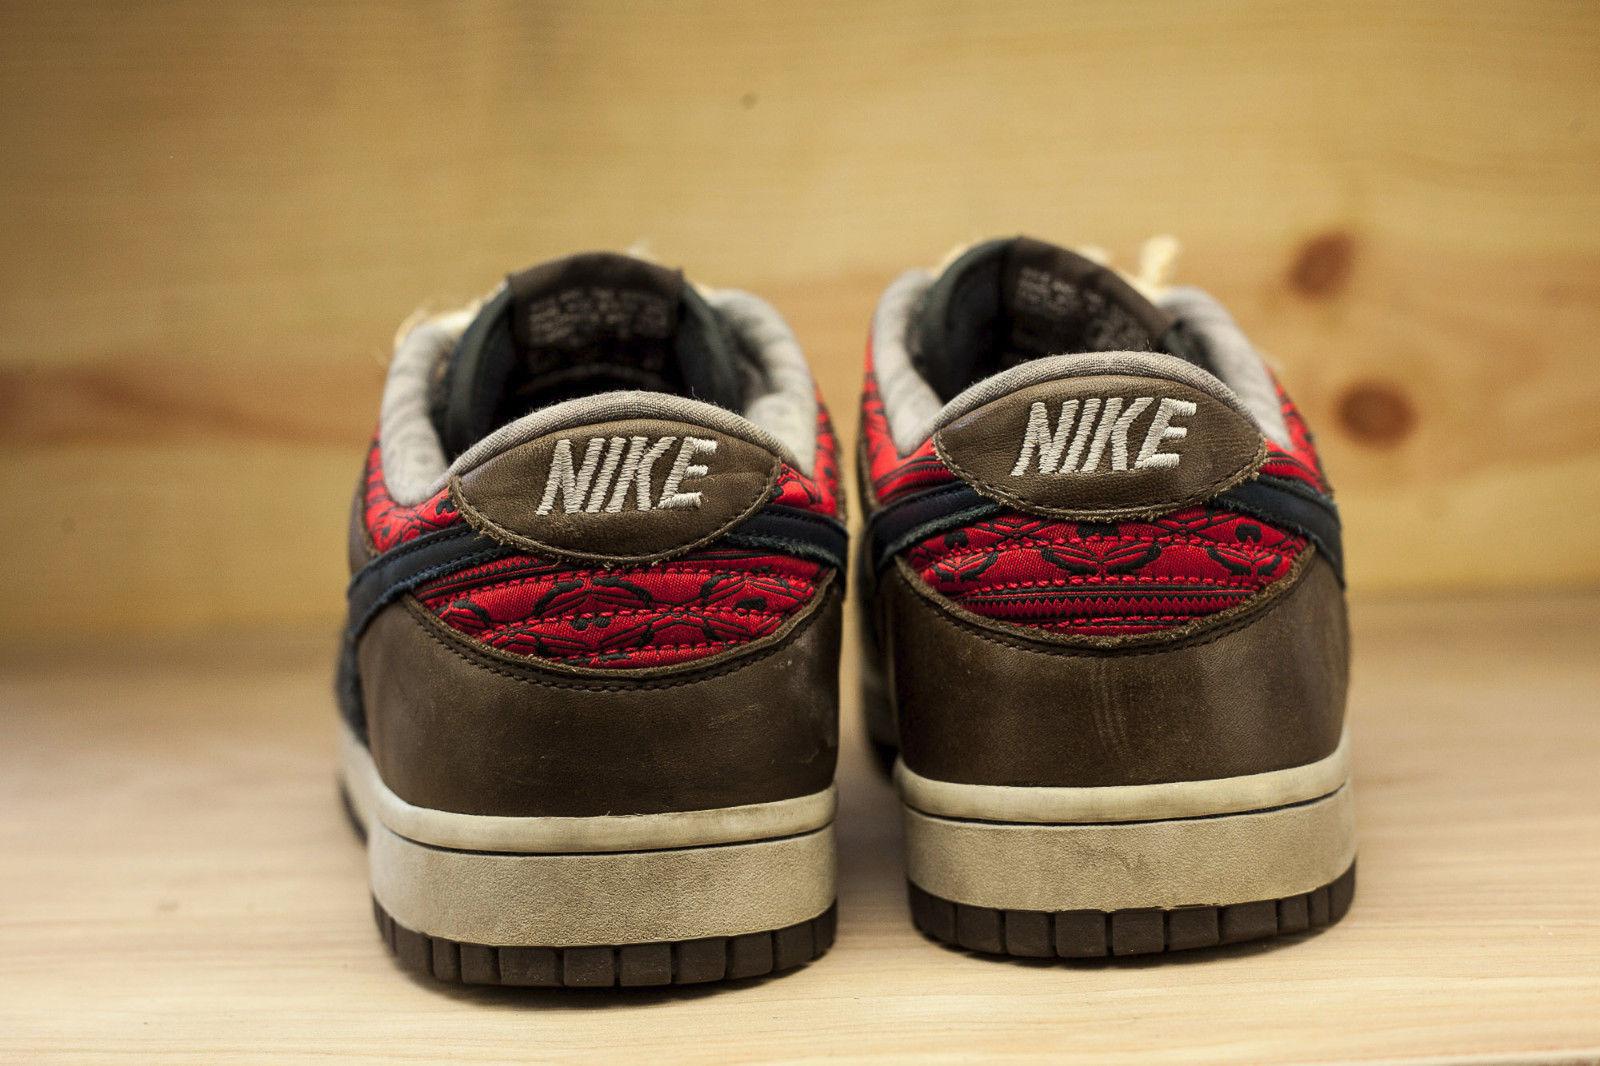 Nike 8.5 Brown Men's Sneakers Shoes